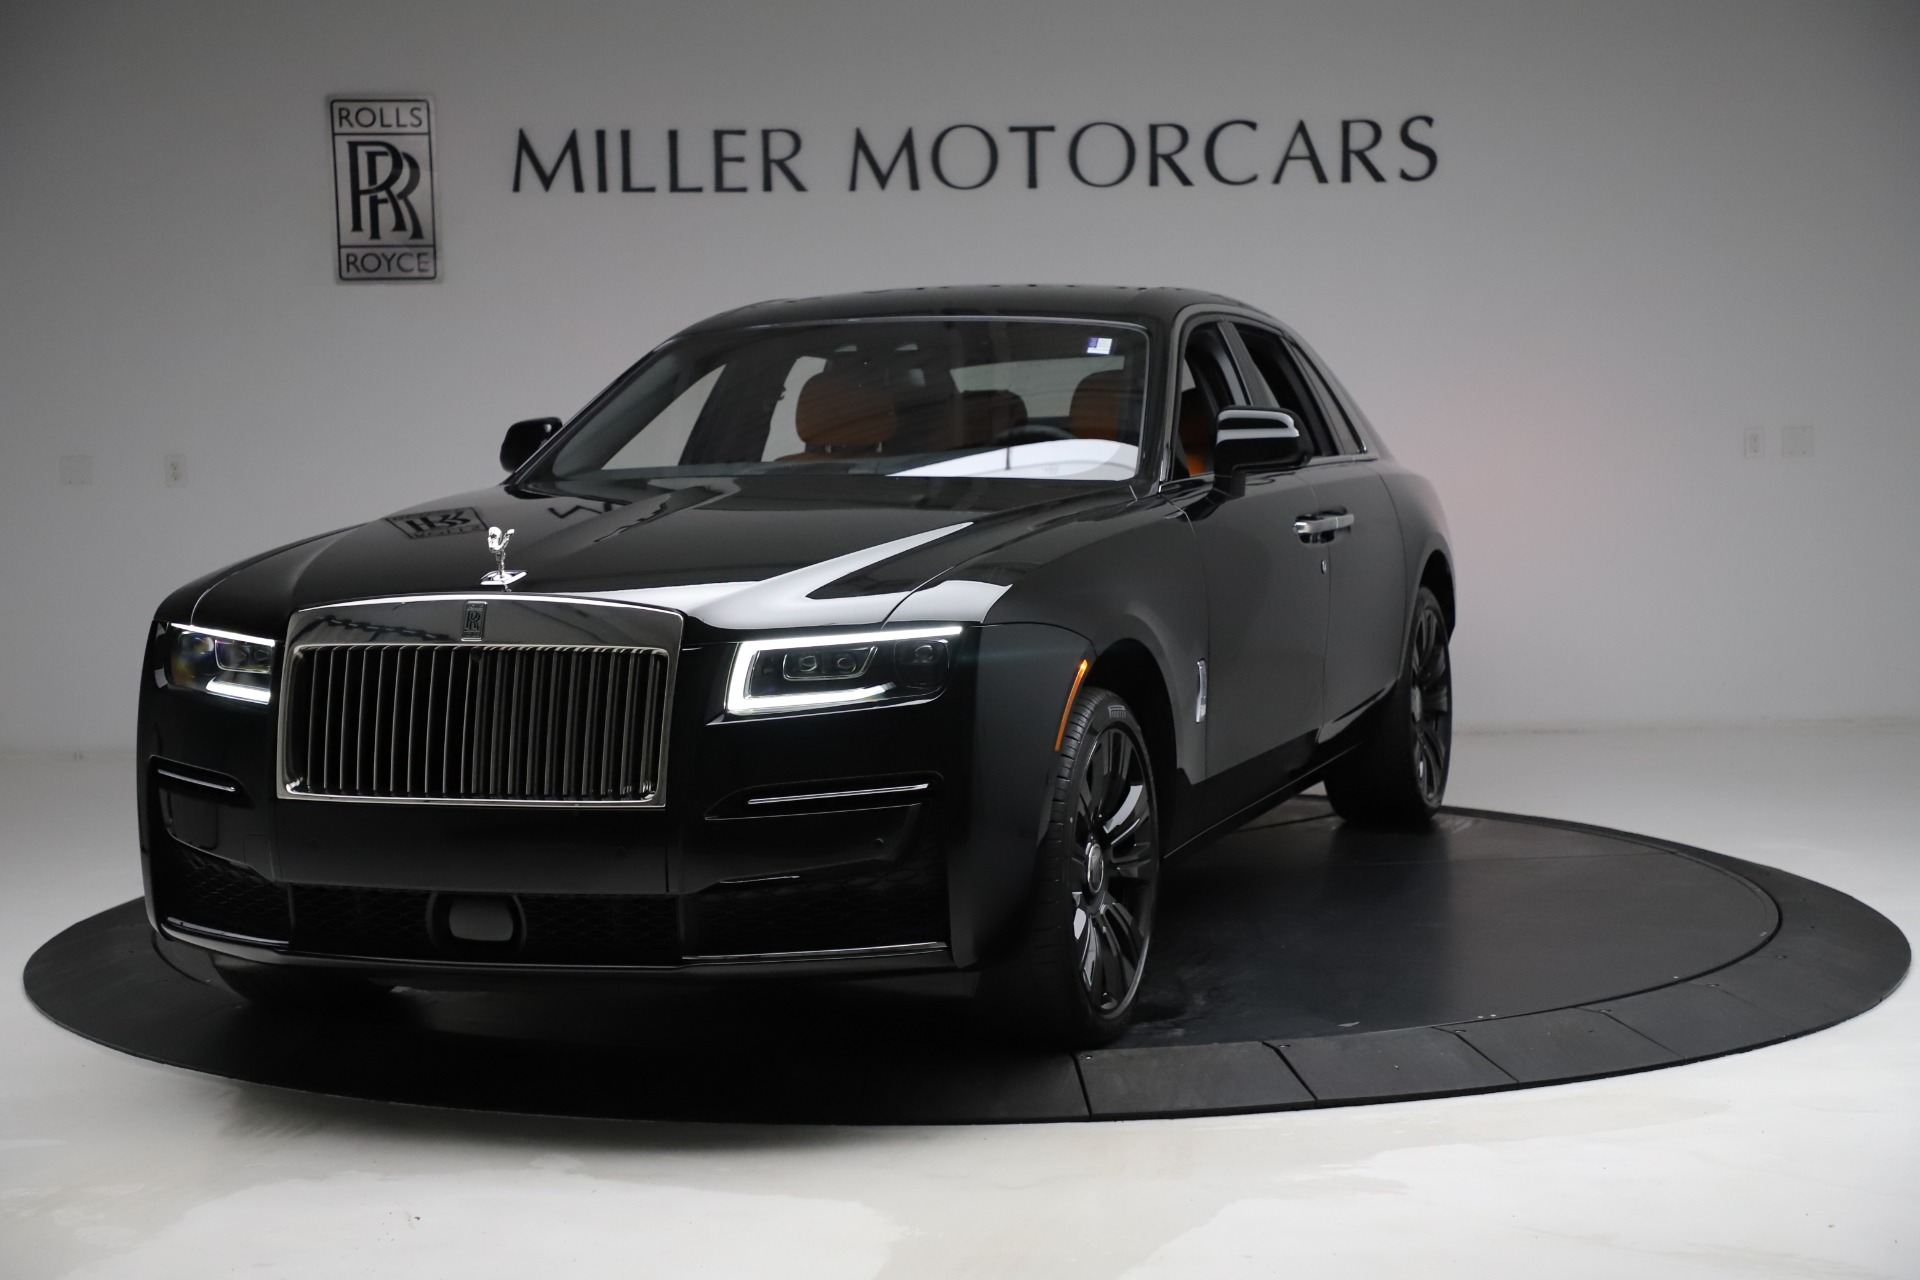 New 2021 Rolls-Royce Ghost for sale Sold at Alfa Romeo of Westport in Westport CT 06880 1